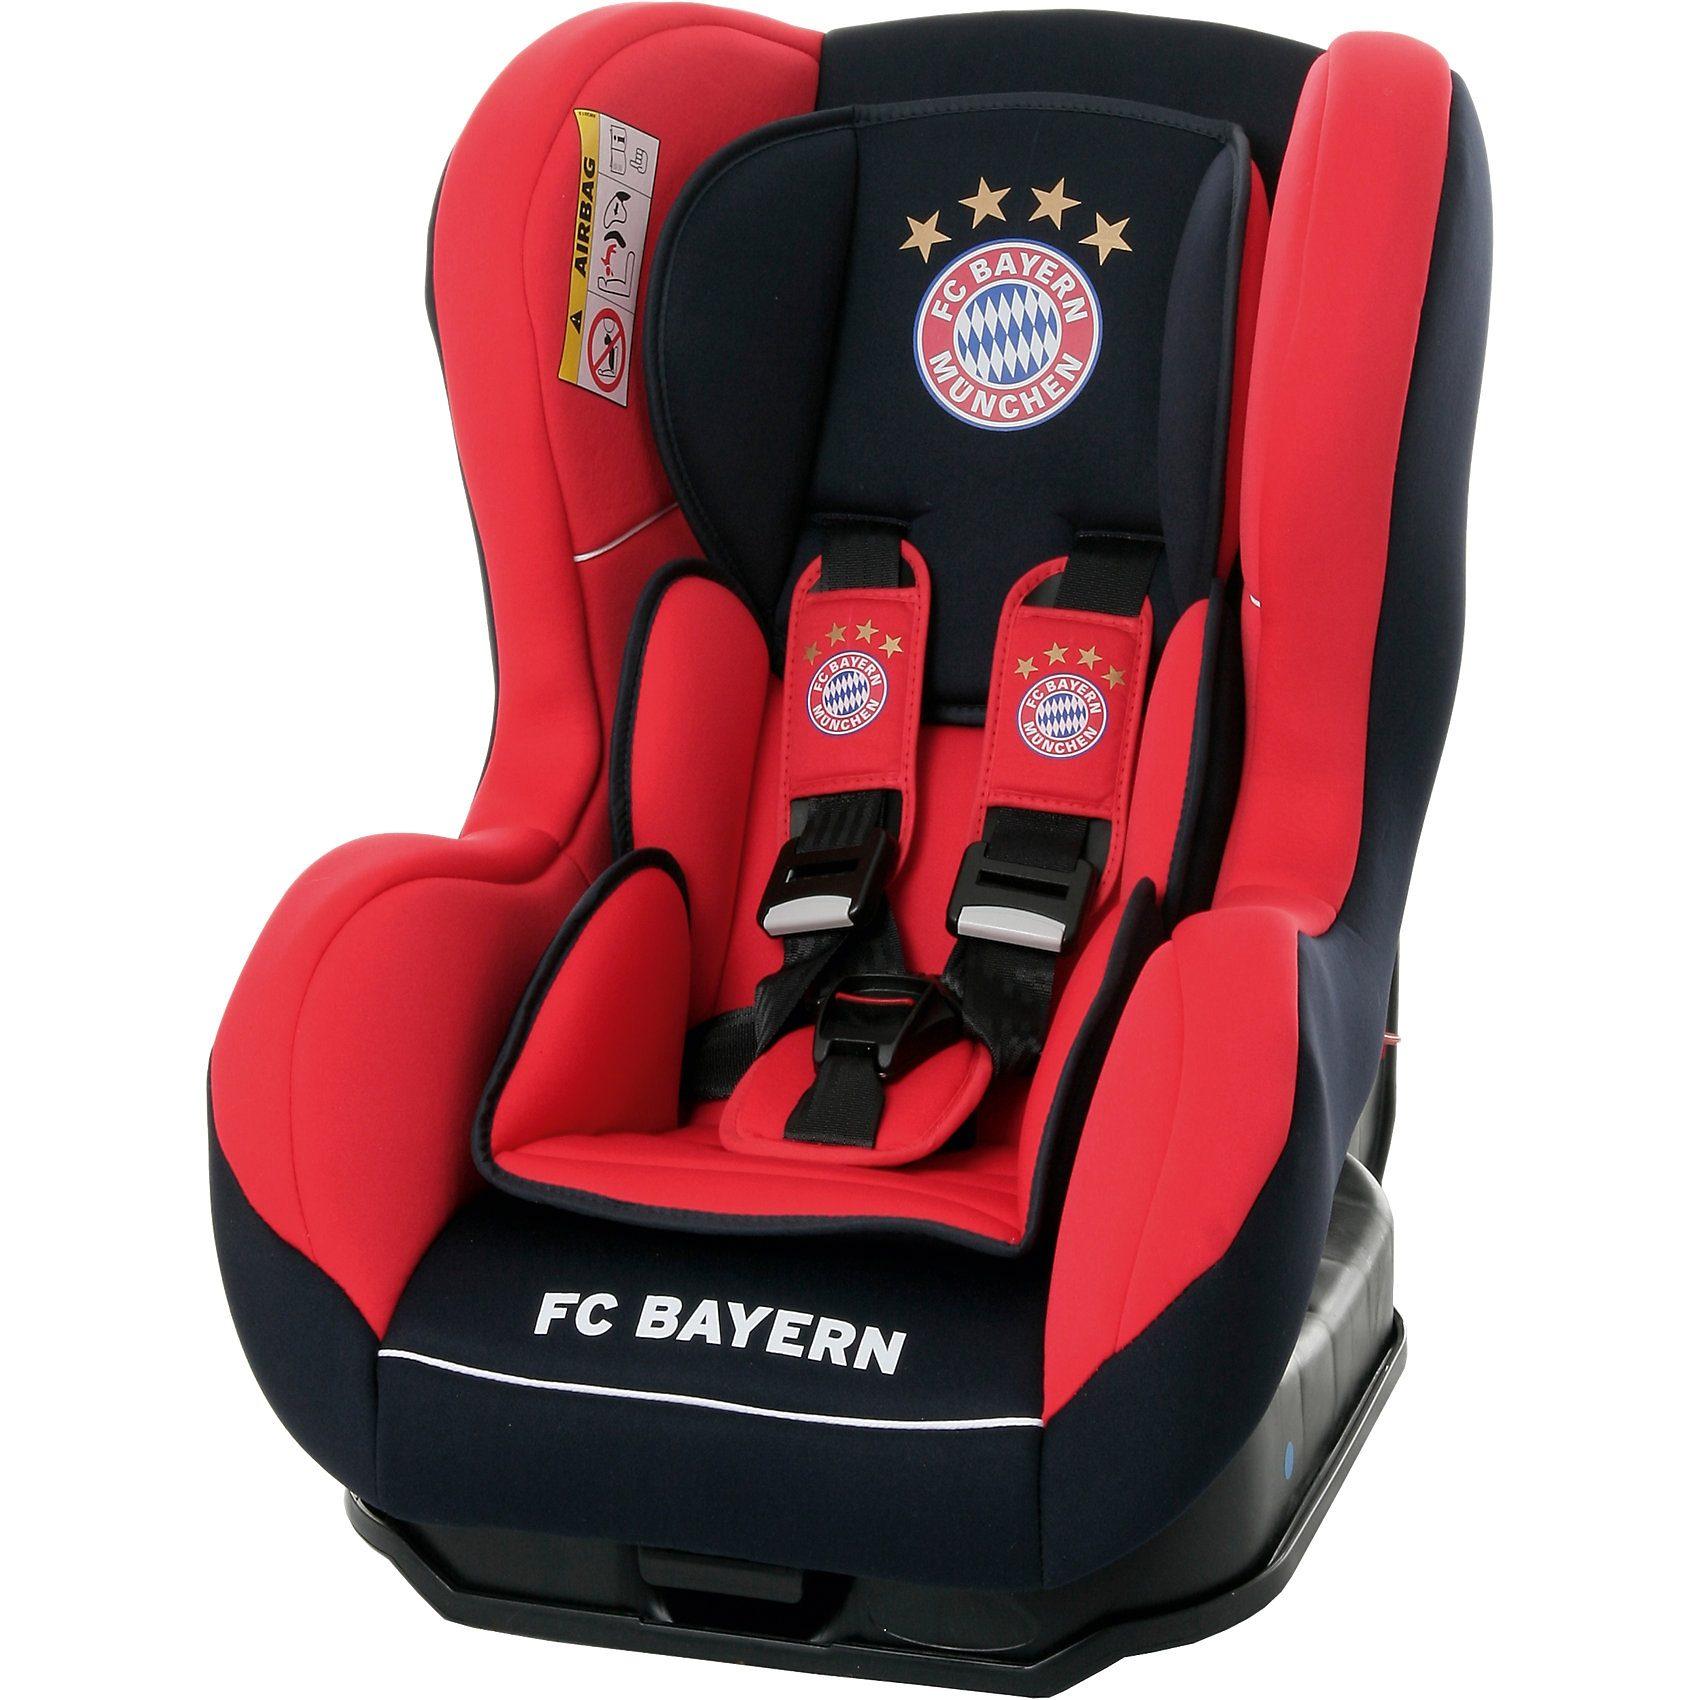 Osann Auto-Kindersitz Safety One, FC Bayern München, 2017